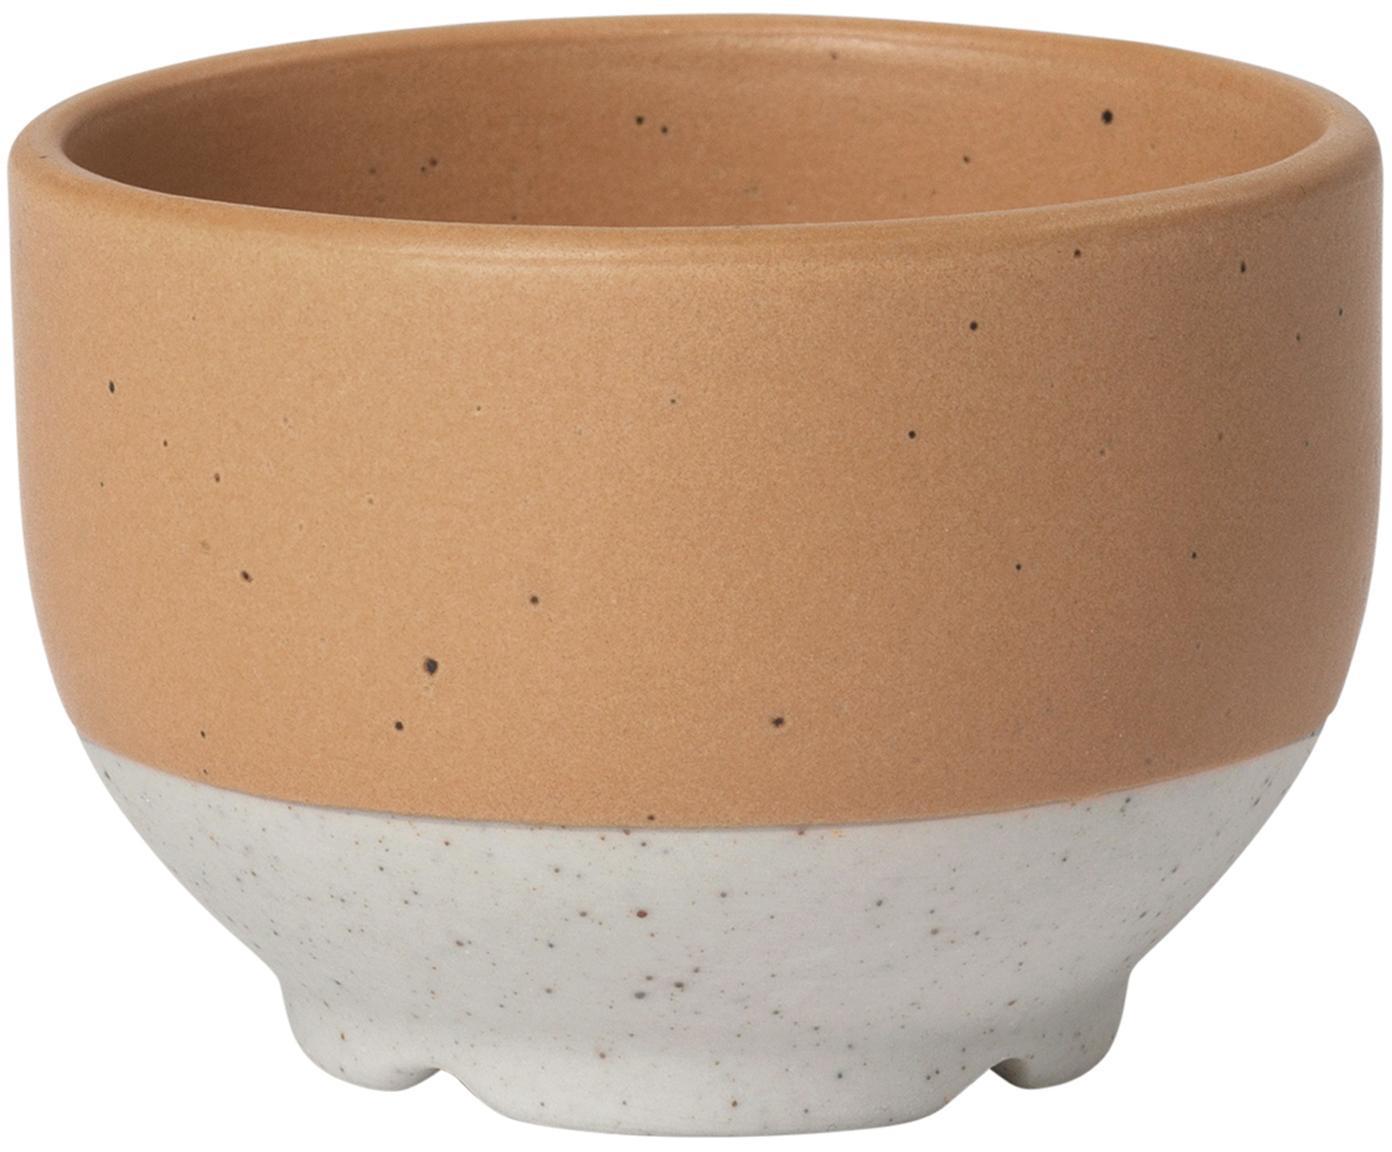 Portauova in terracotta con finitura opaca Eli 4 pz, Gres, Marrone chiaro, beige, Ø 5 x Alt. 4 cm